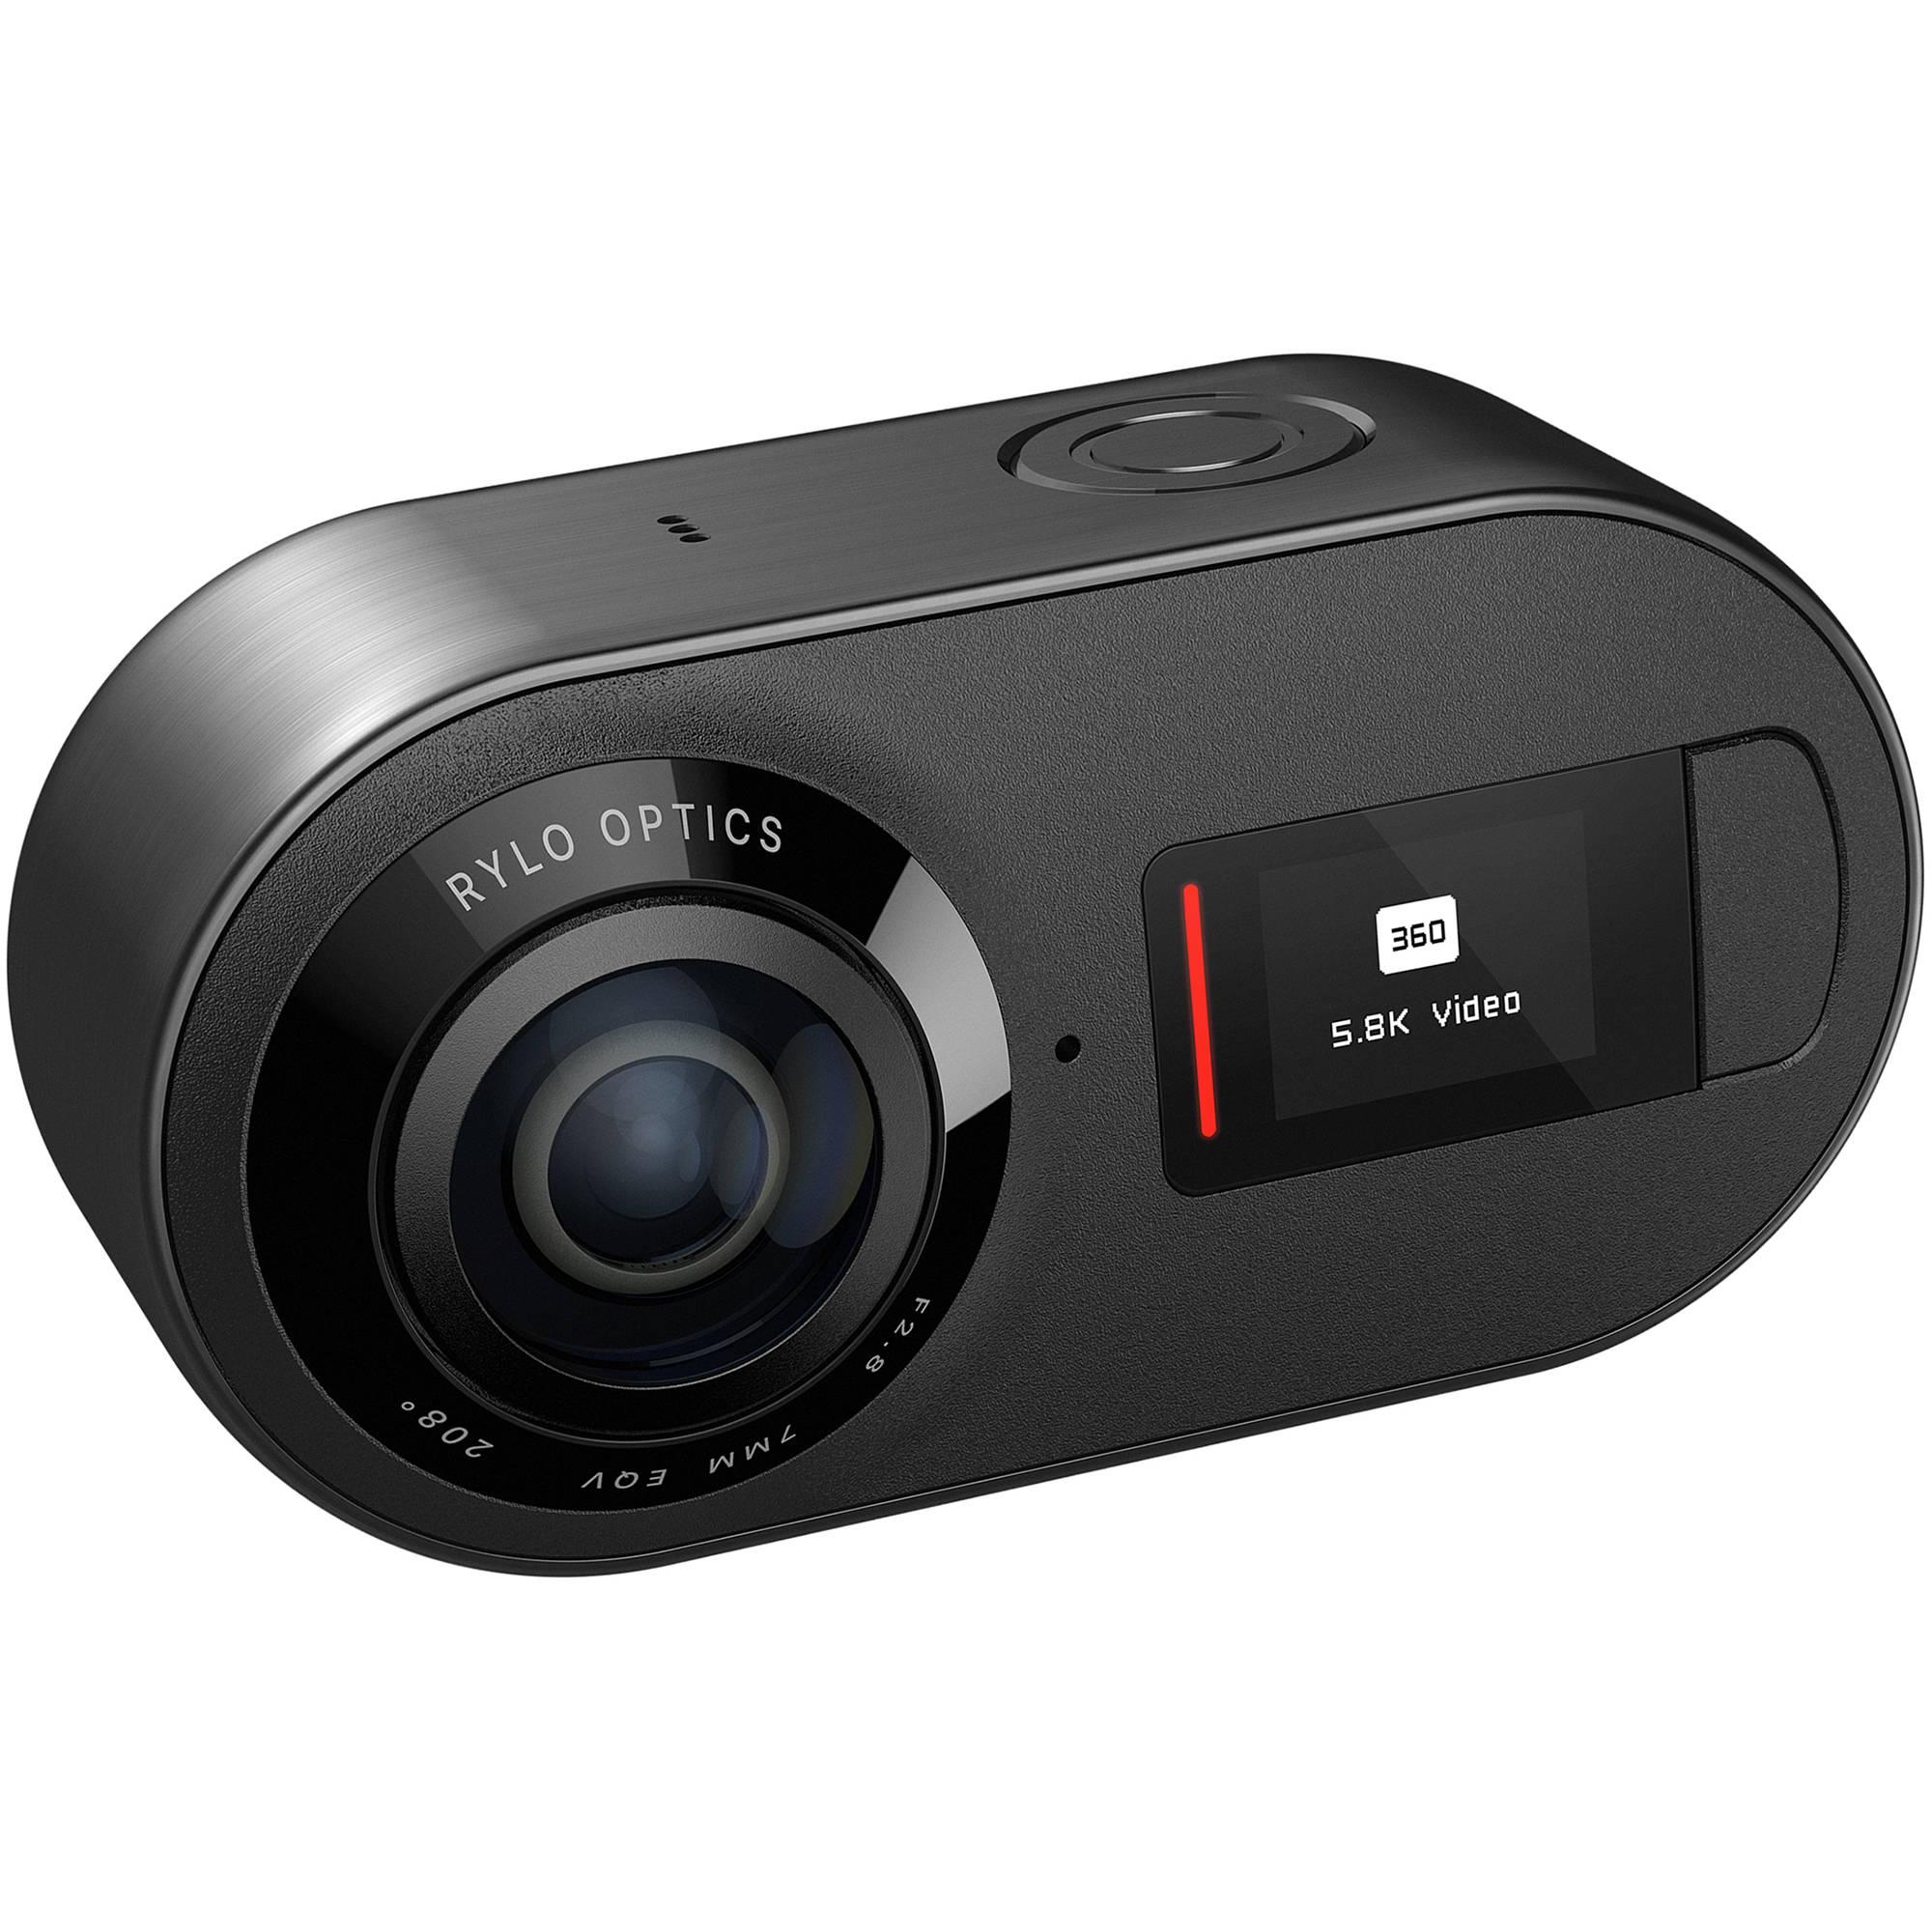 Rylo 360° 5.8K Video Camera AR01-NA02-US01 B&H Photo Video